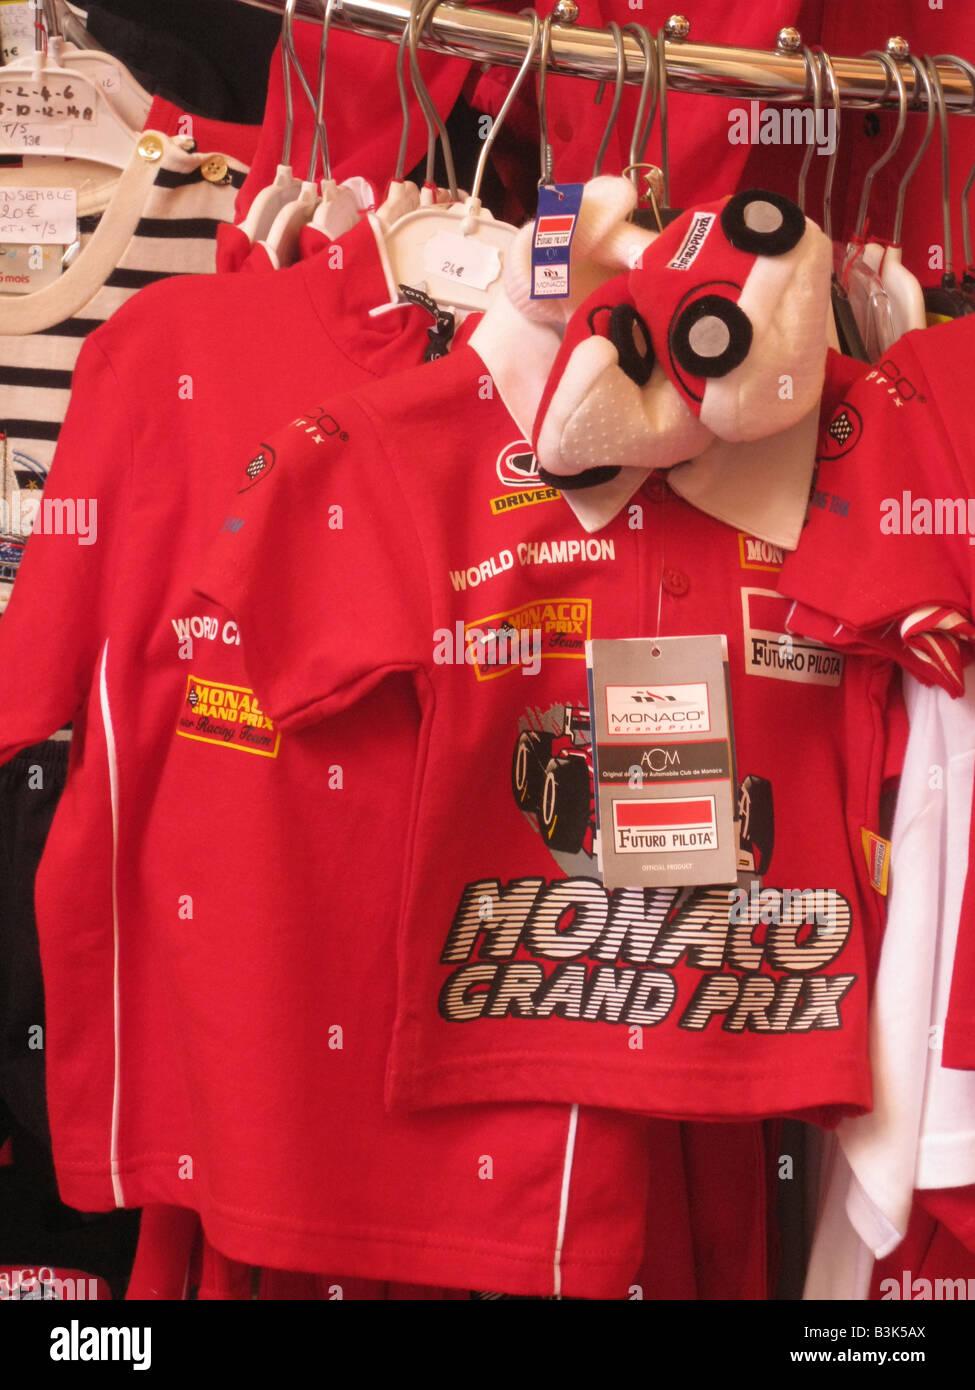 MONACO shop selling Grand Prix fashions - Stock Image